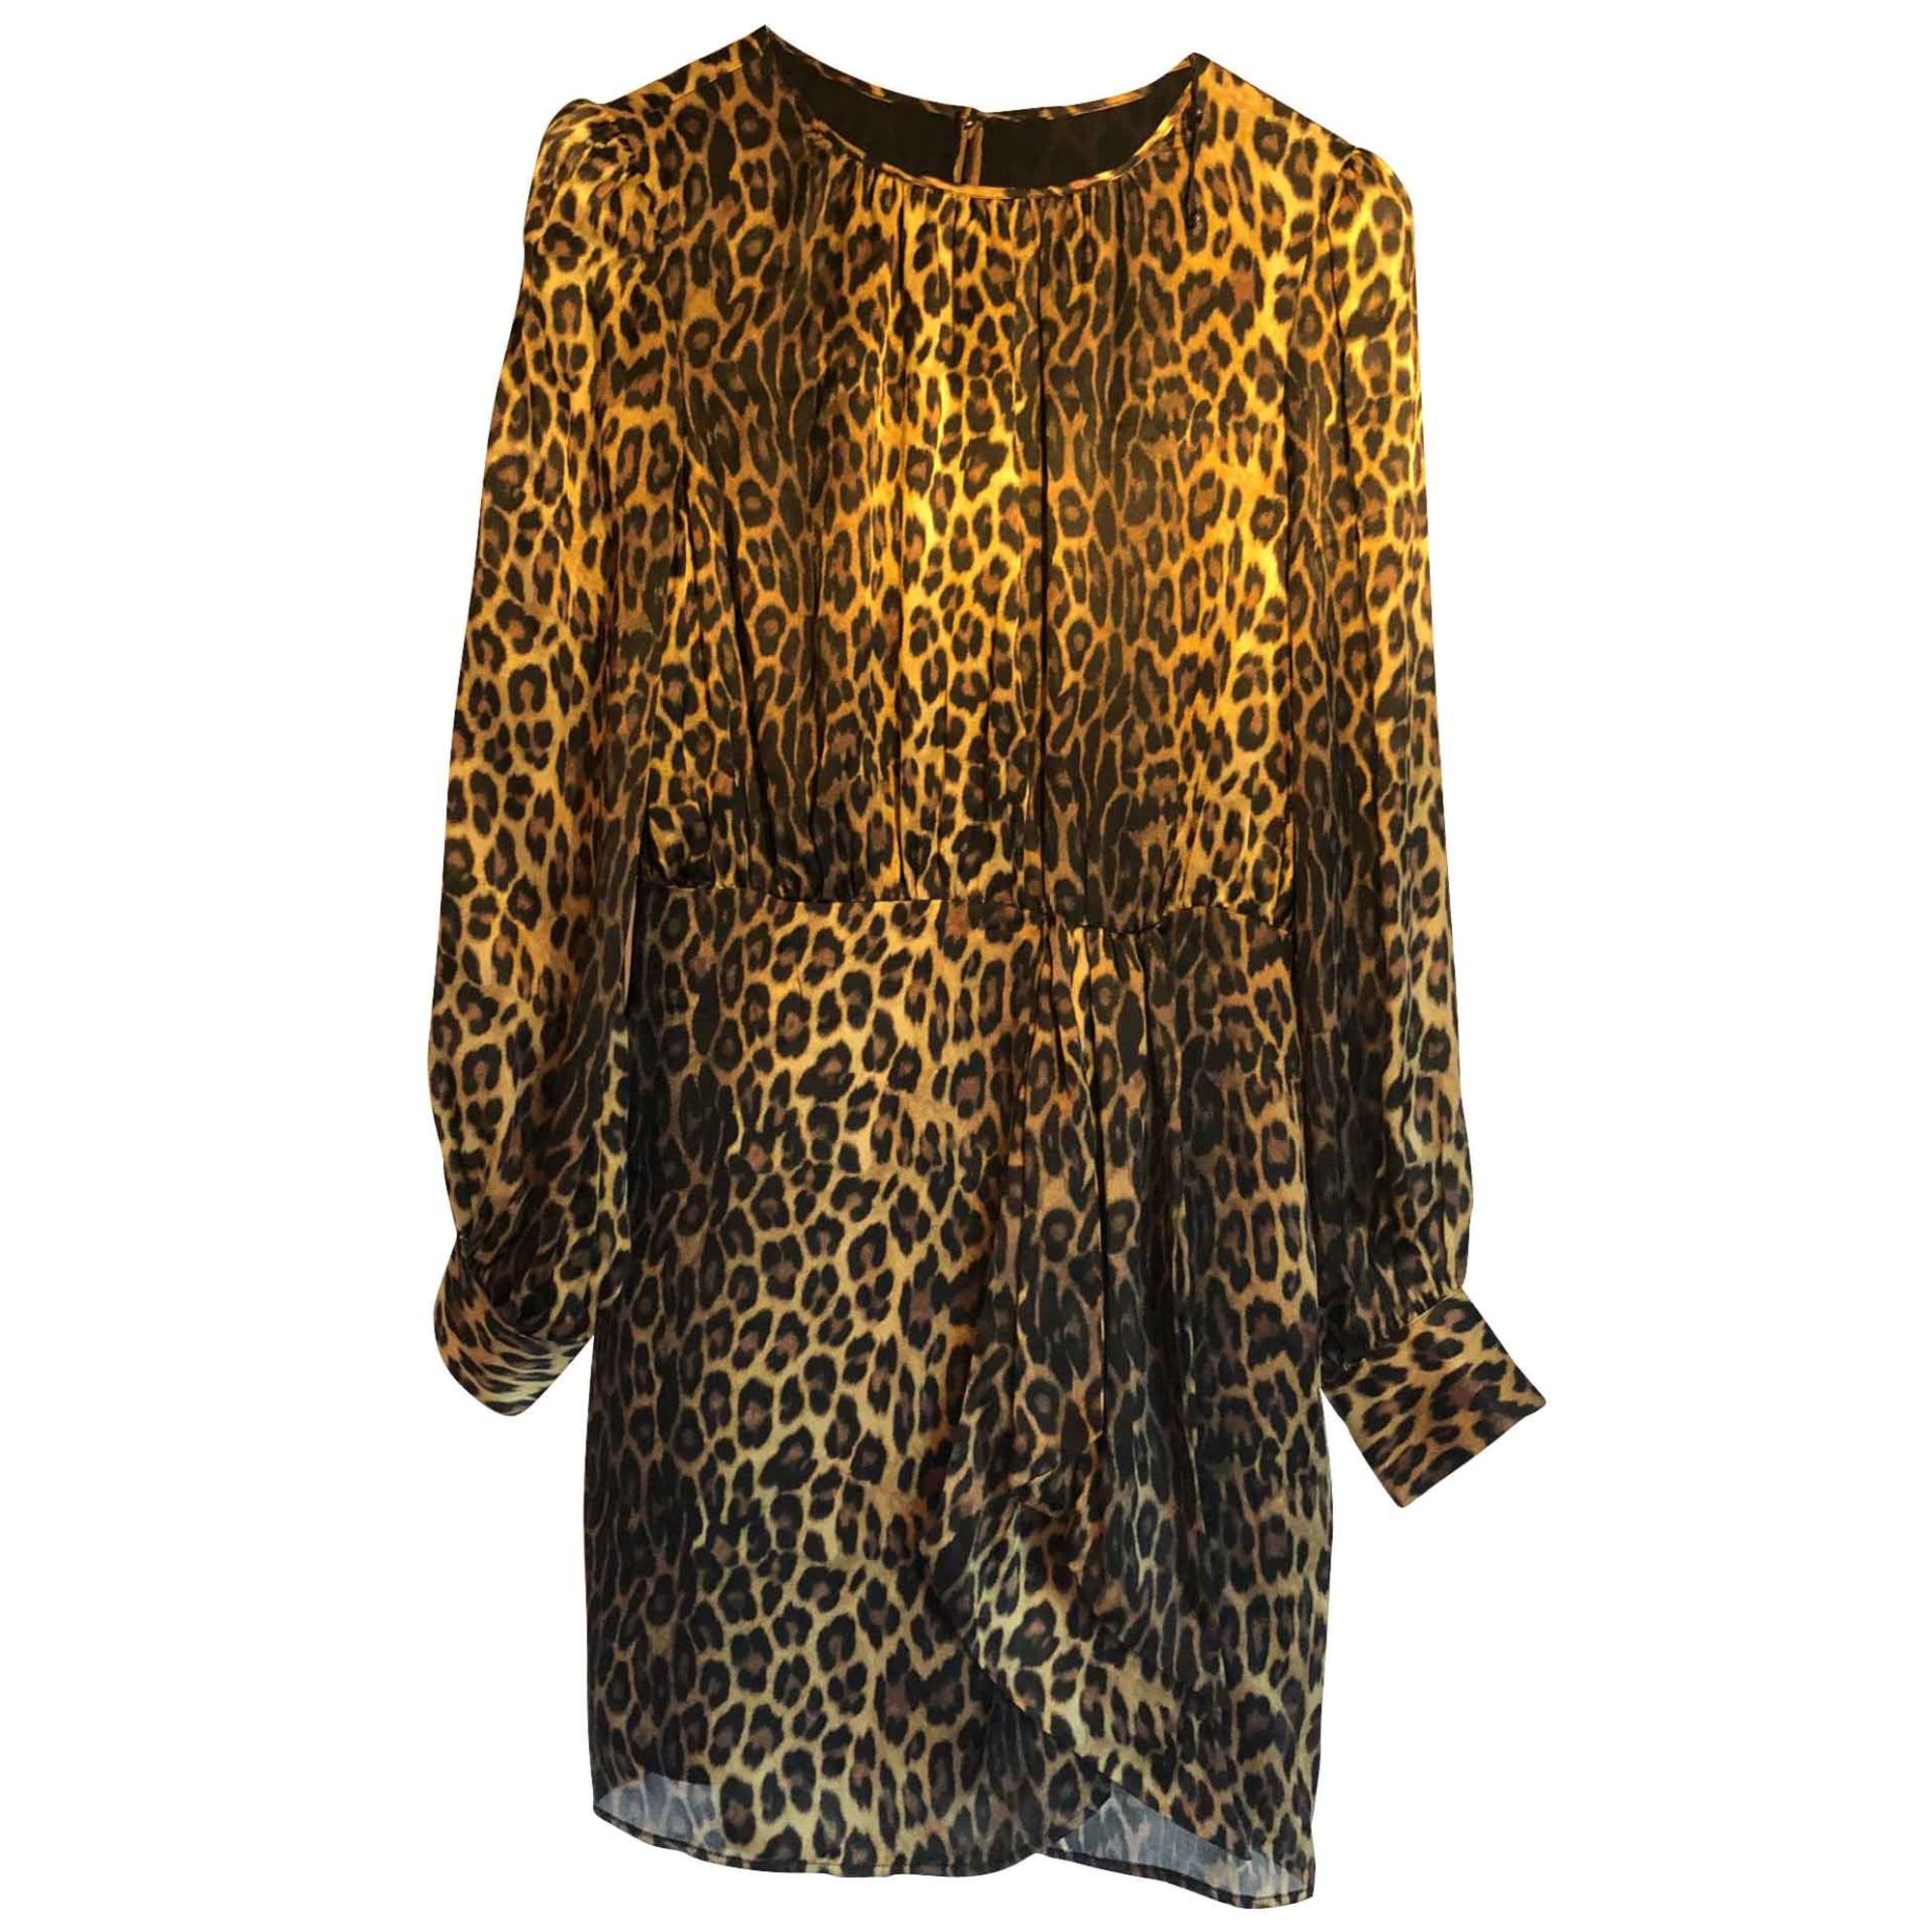 Robe courte THE KOOPLES Imprimés animaliers